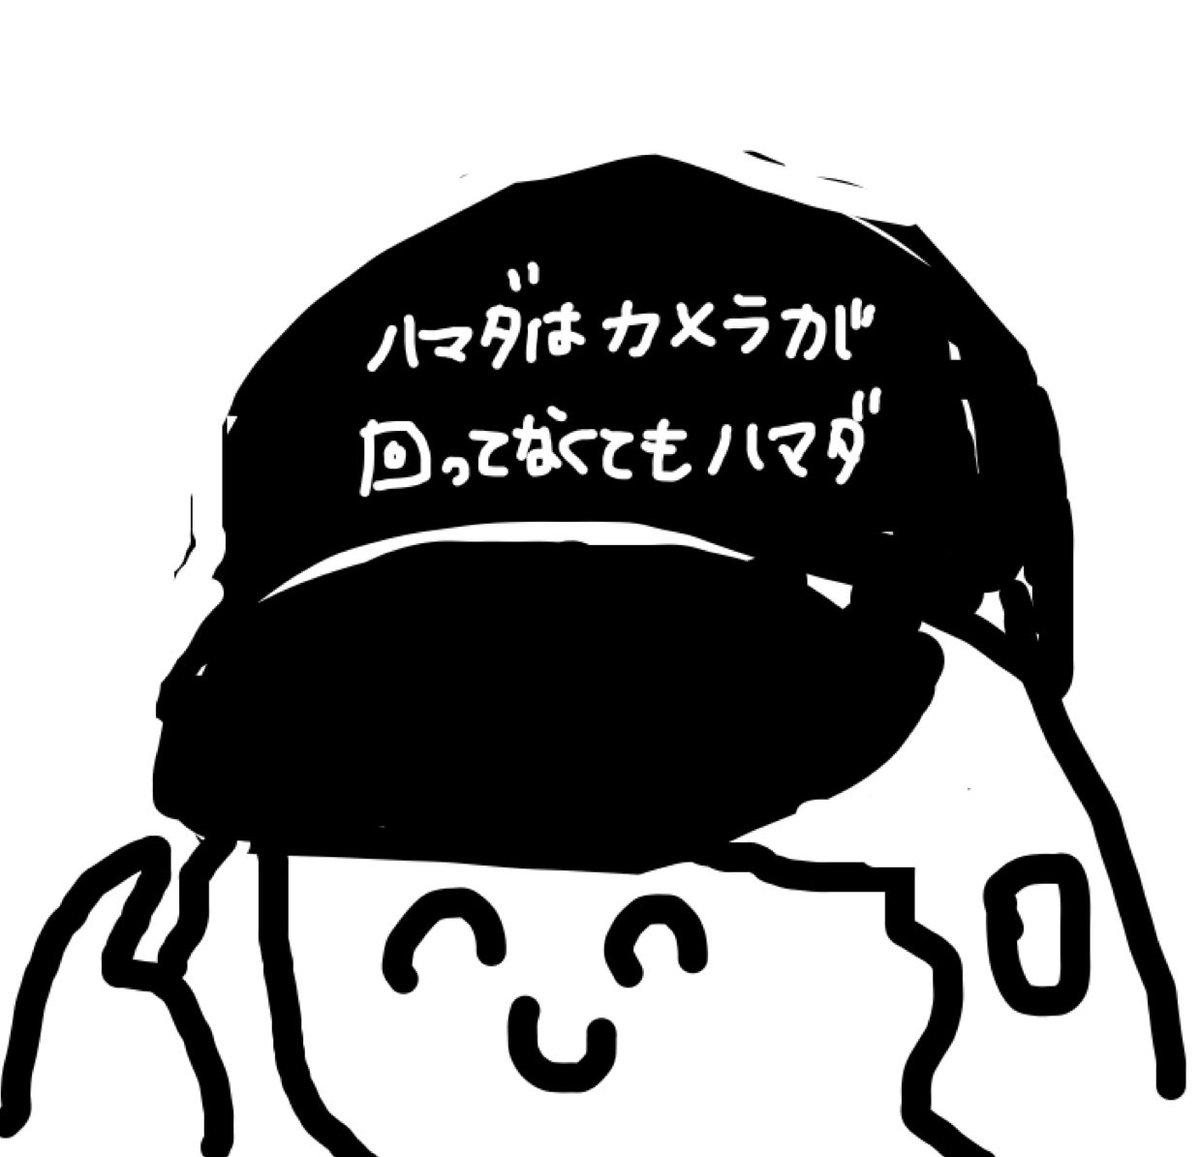 DPgLeDfUMAAw1hM.jpg